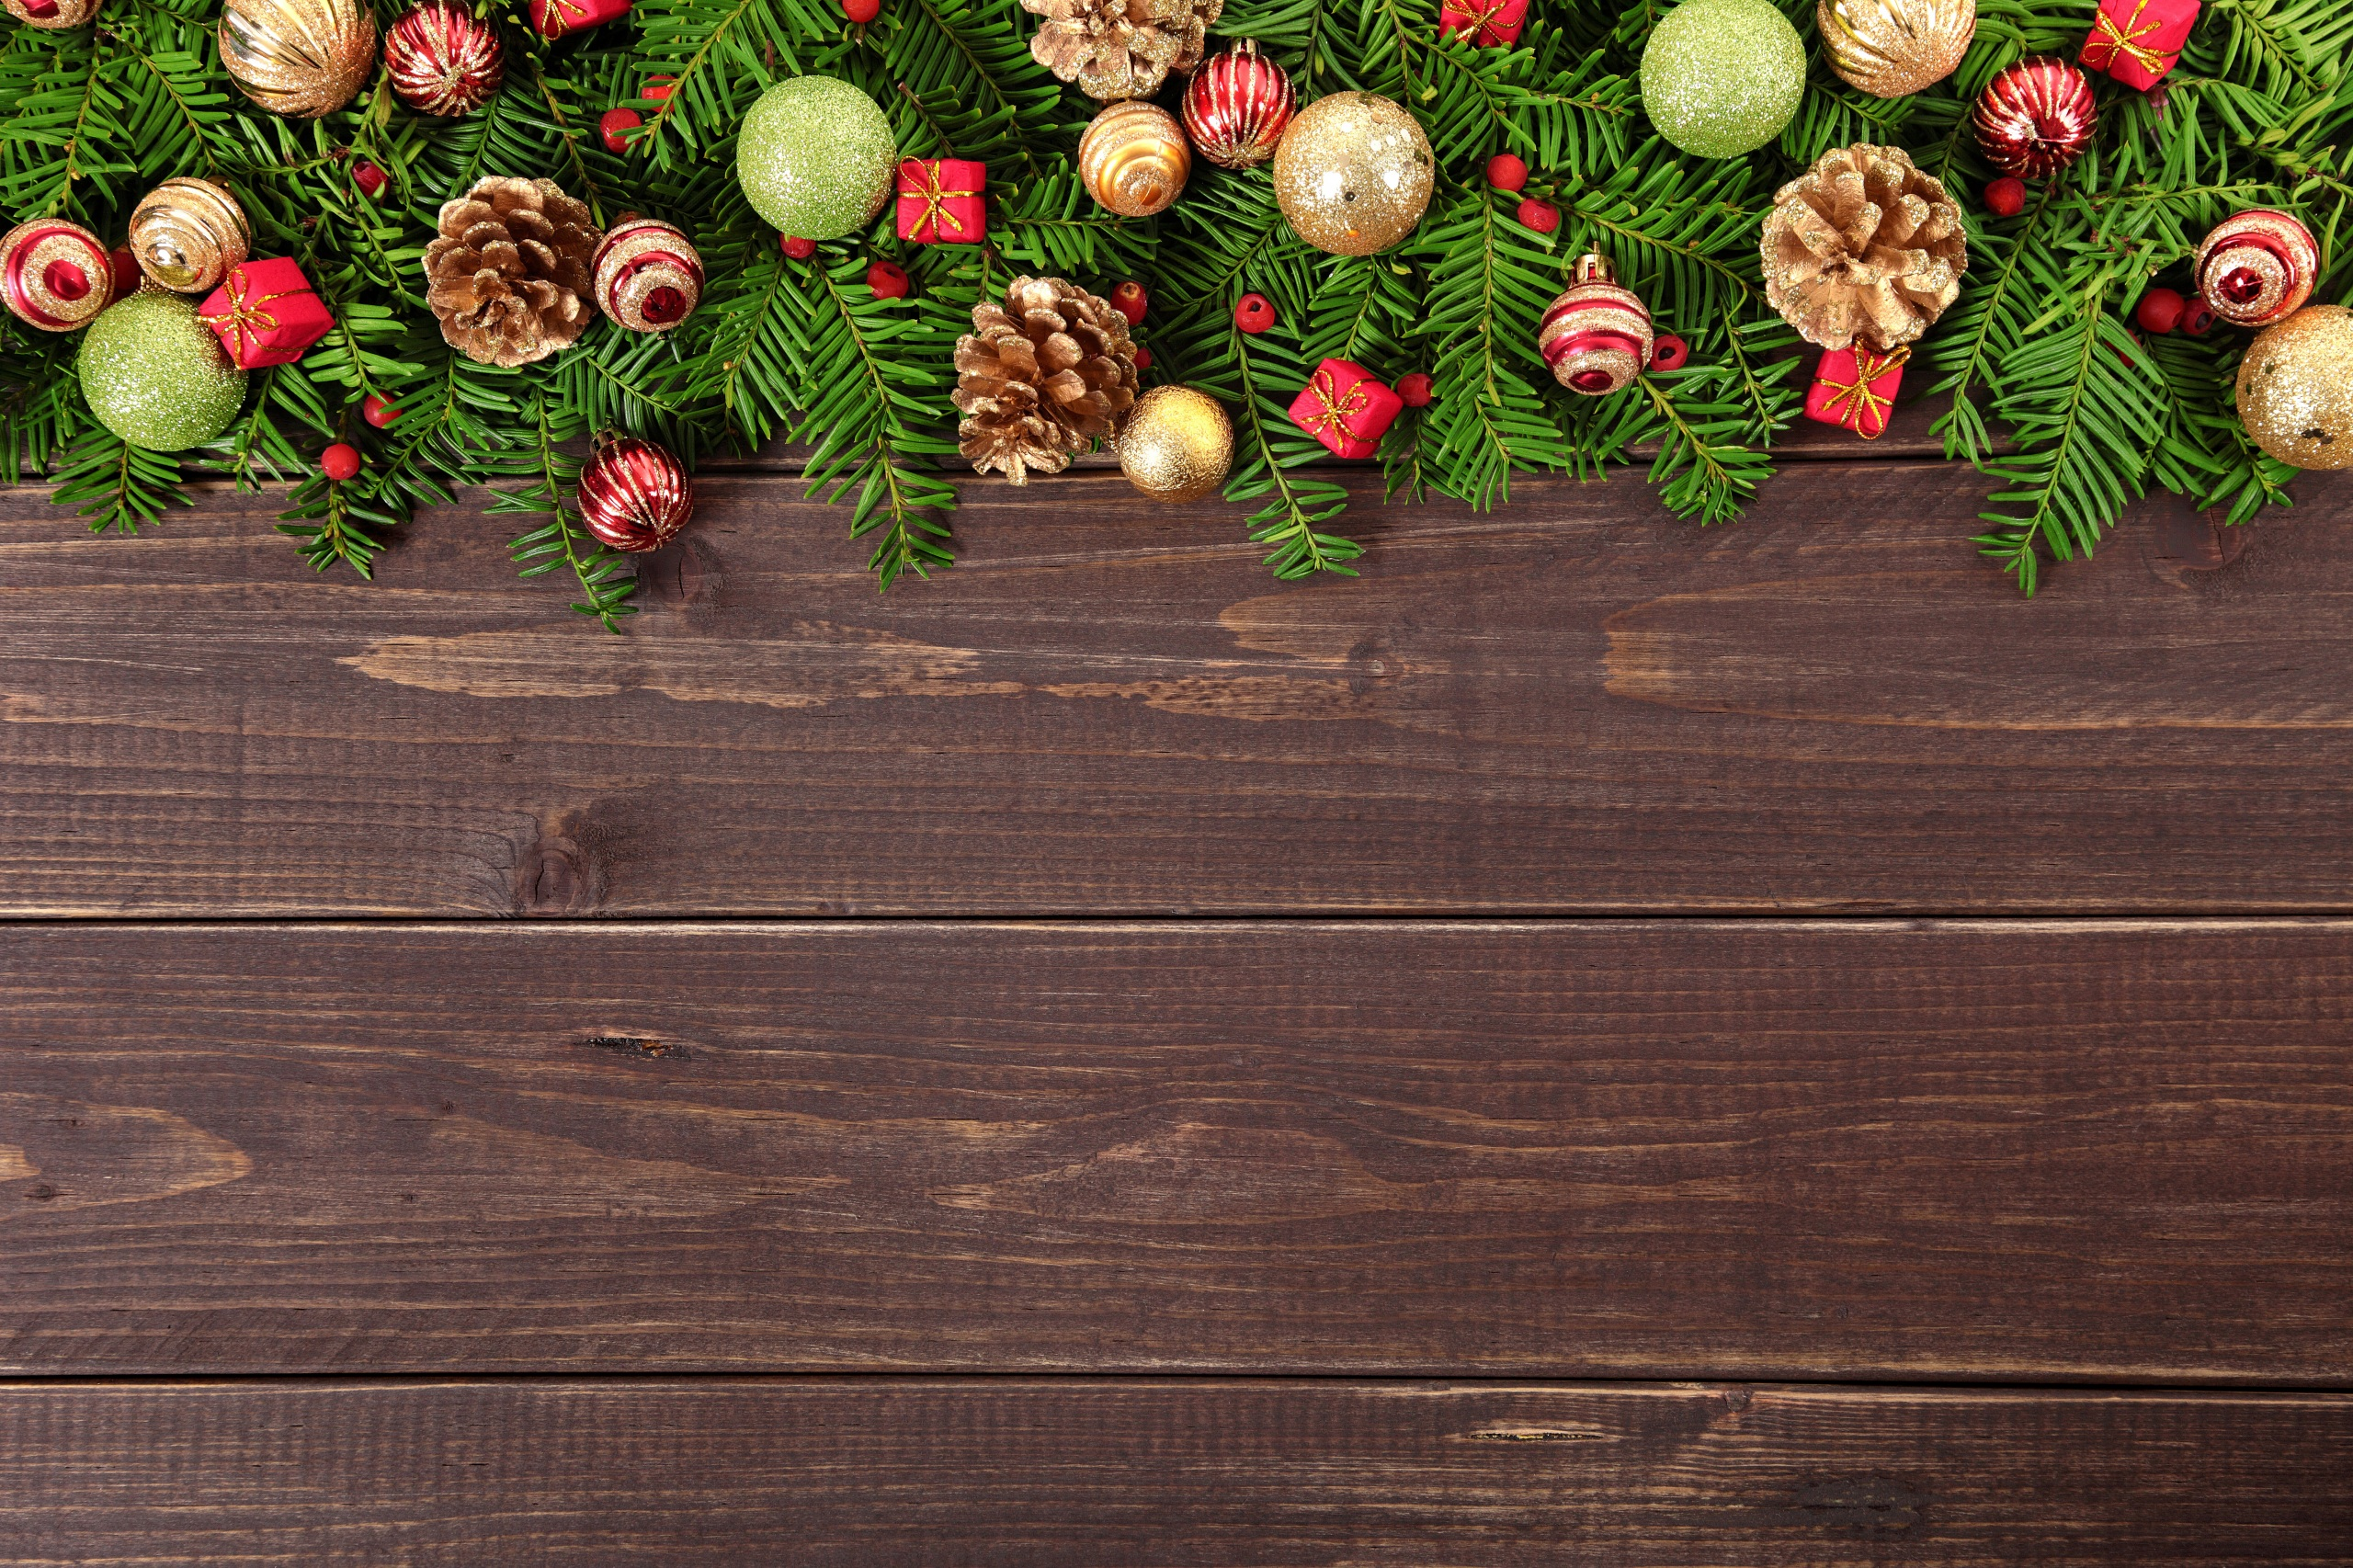 Картинка Рождество Шар шишка Доски 2560x1706 Новый год Шишки Шарики